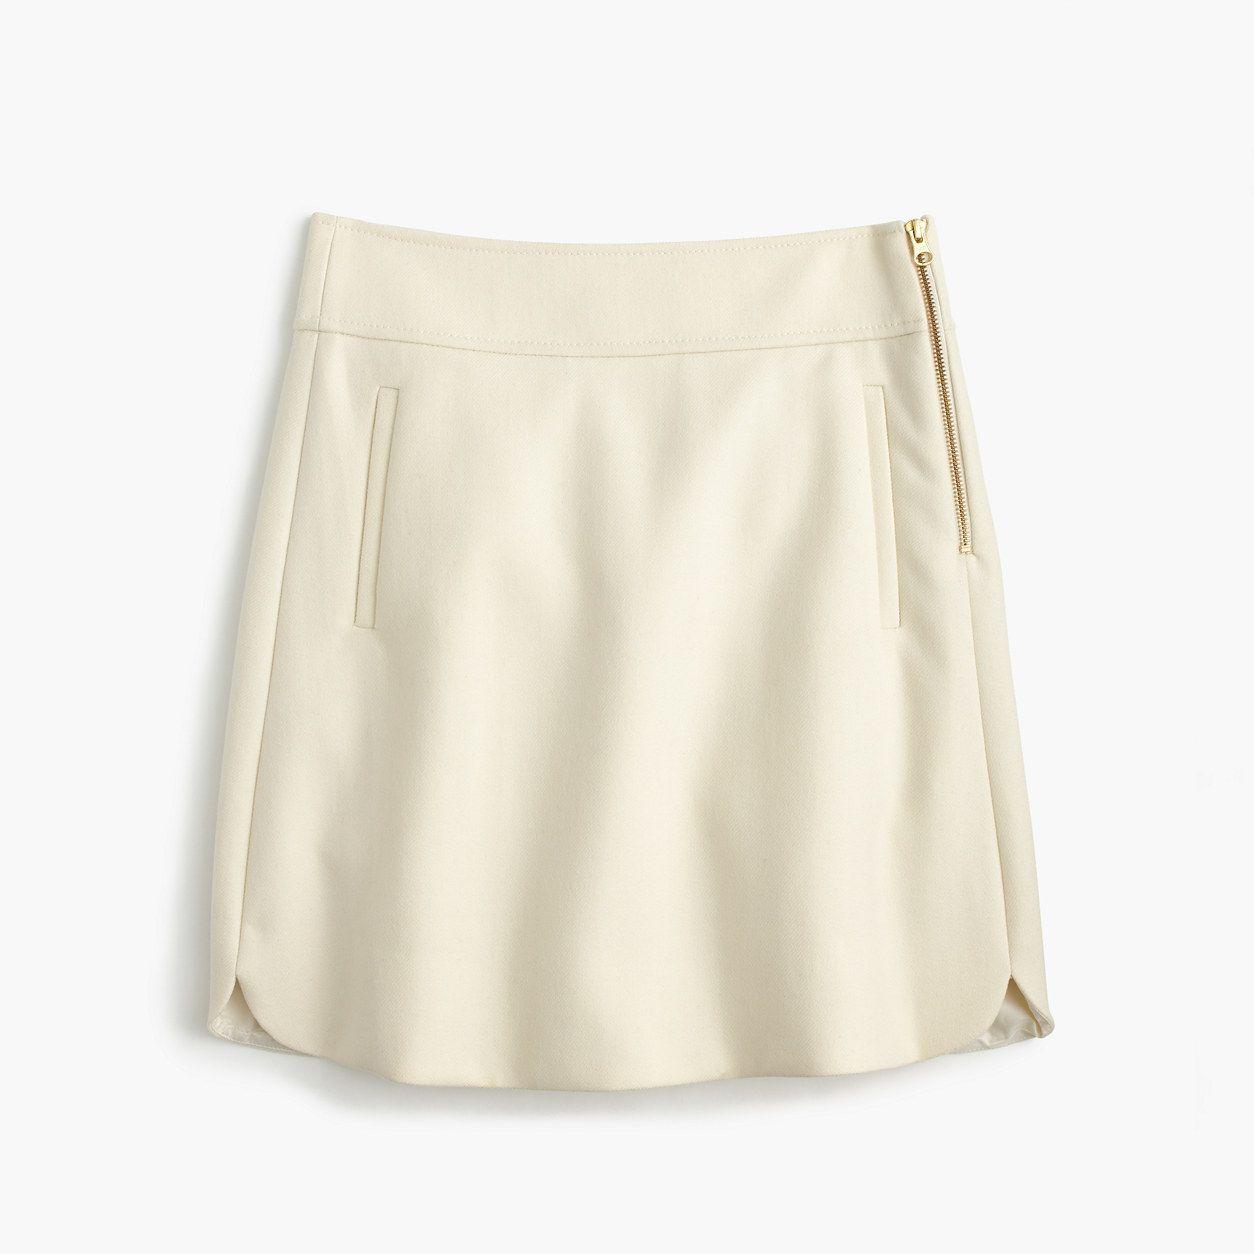 J.Crew Womens Petite Mini Skirt In Double-Serge Wool (Size 10 Petite ... 31b8d97ec